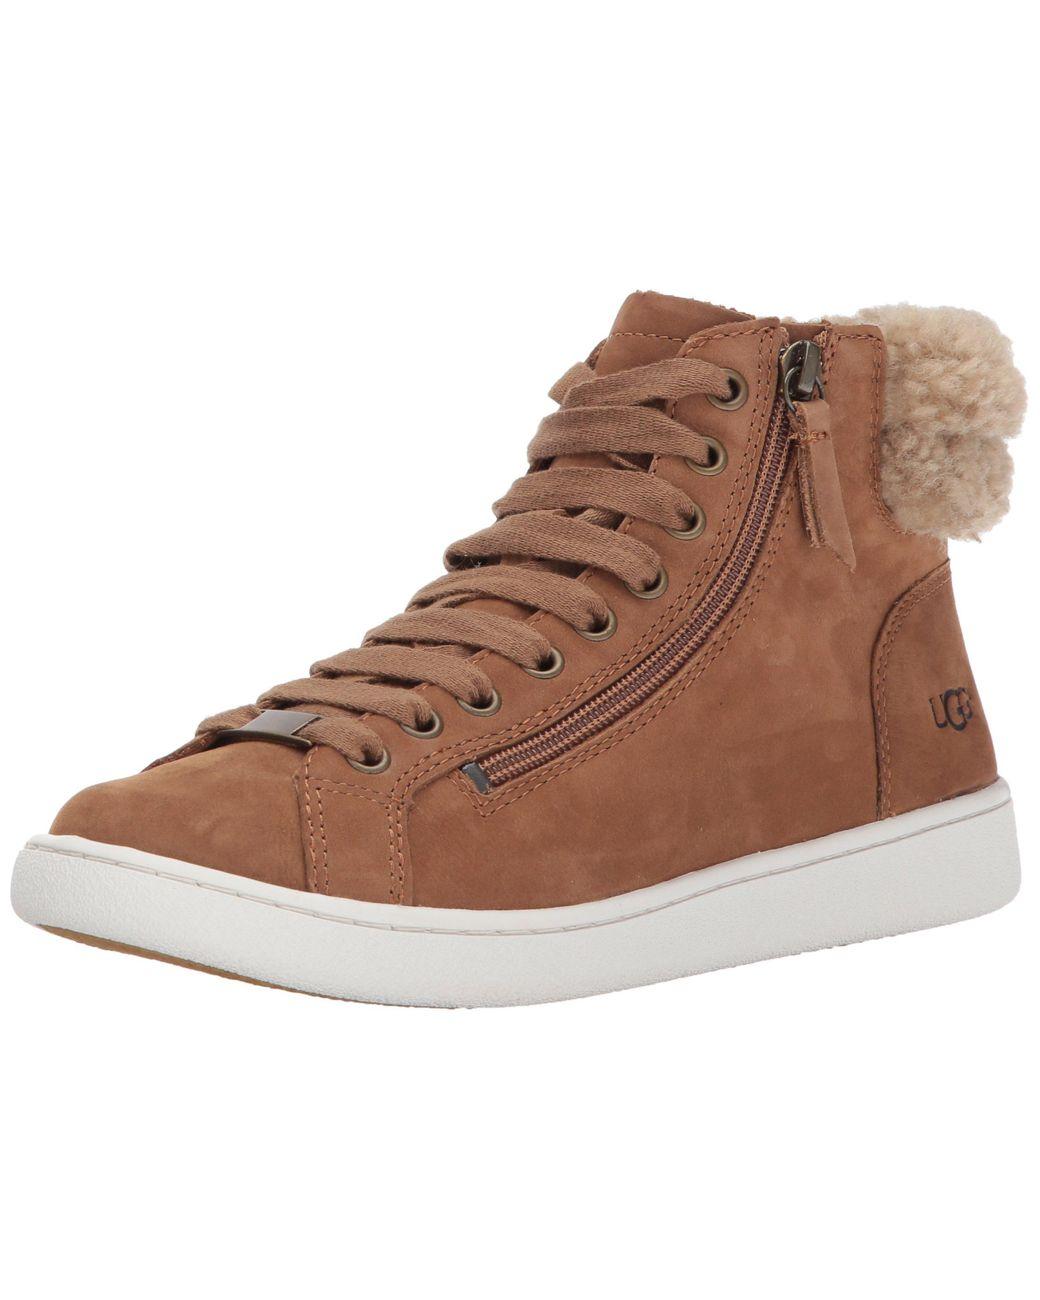 UGG Leather Olive Fashion Sneaker